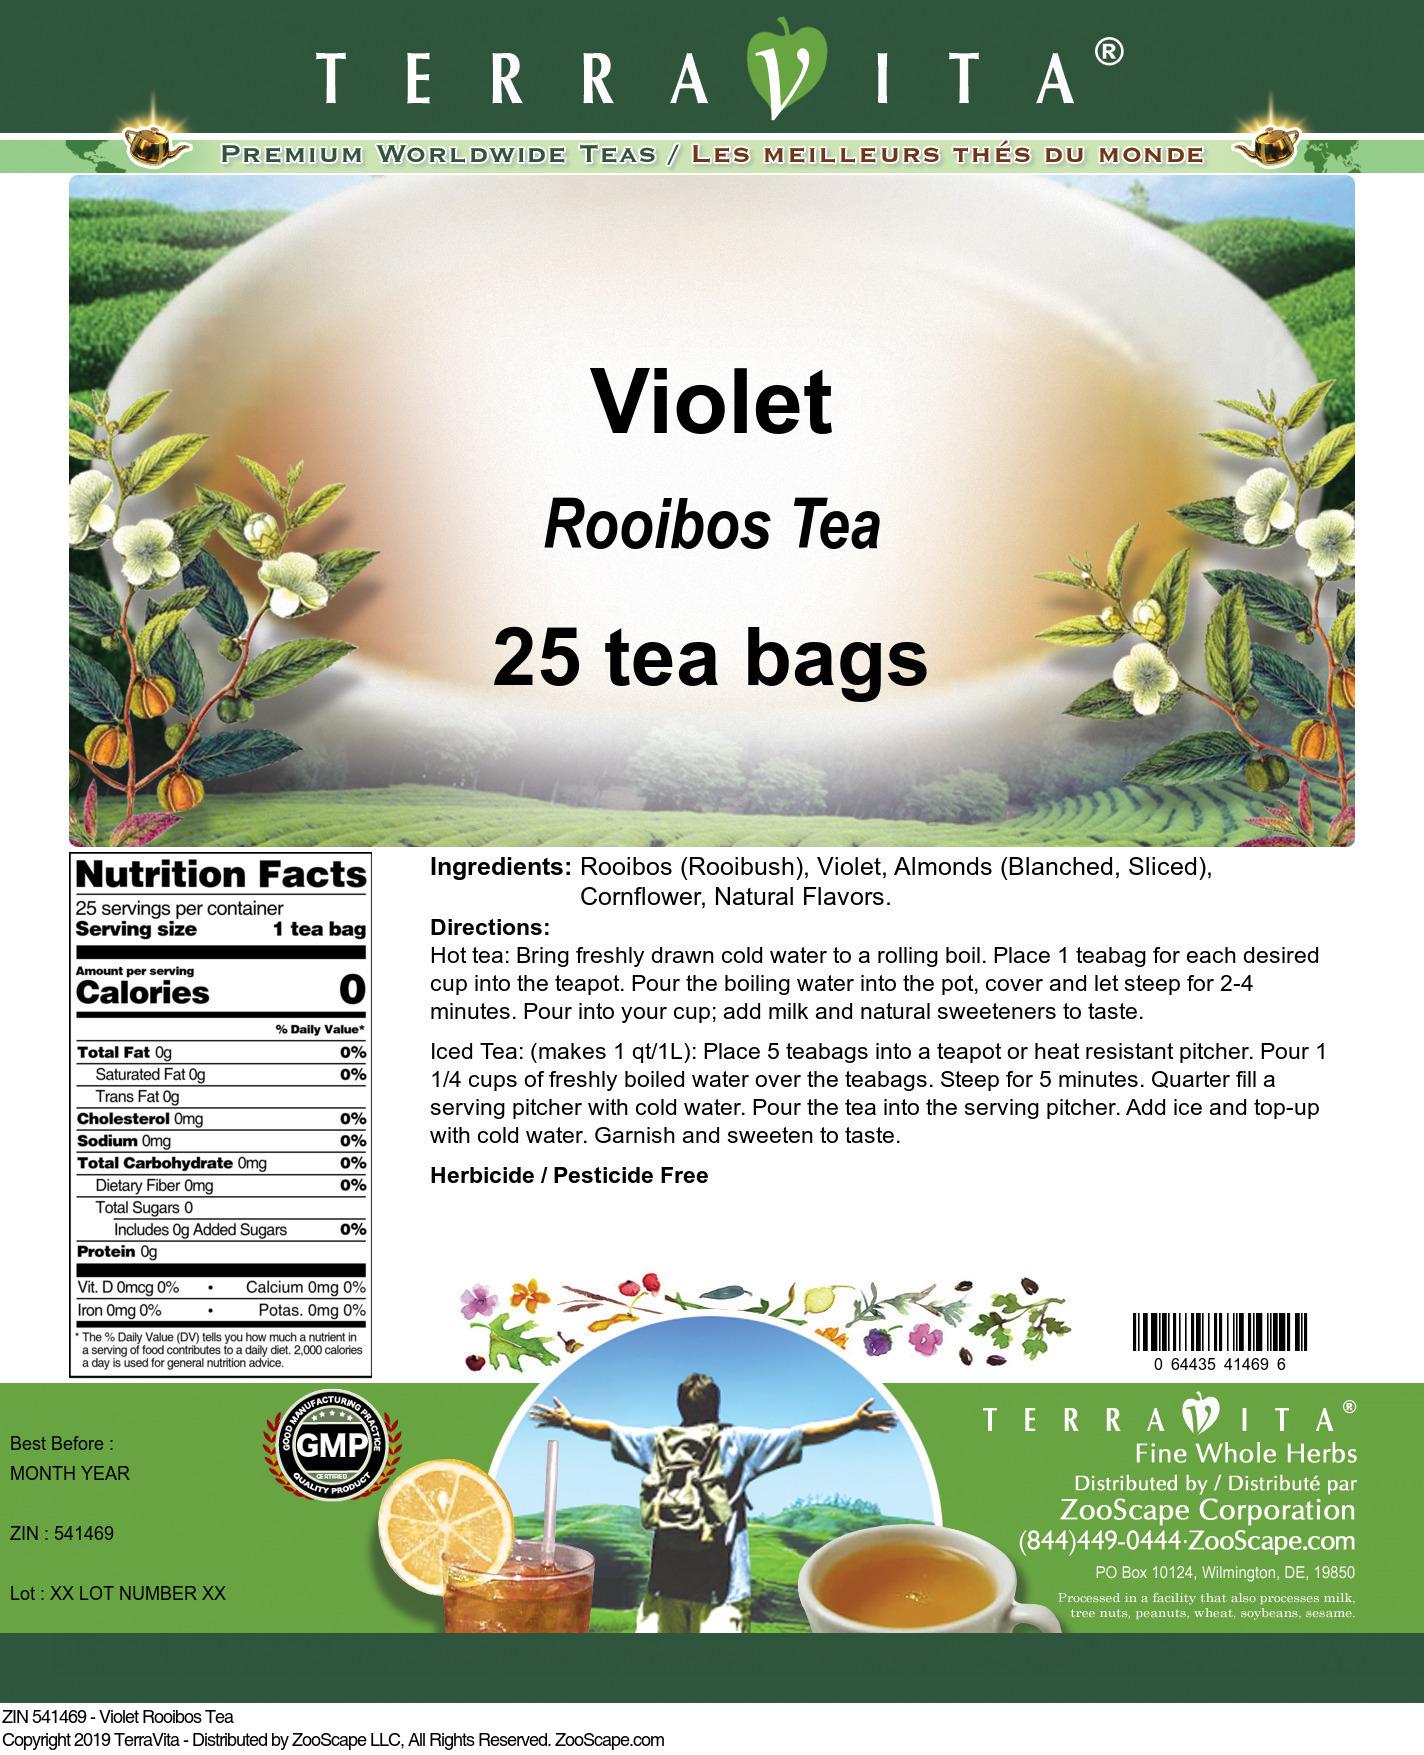 Violet Rooibos Tea